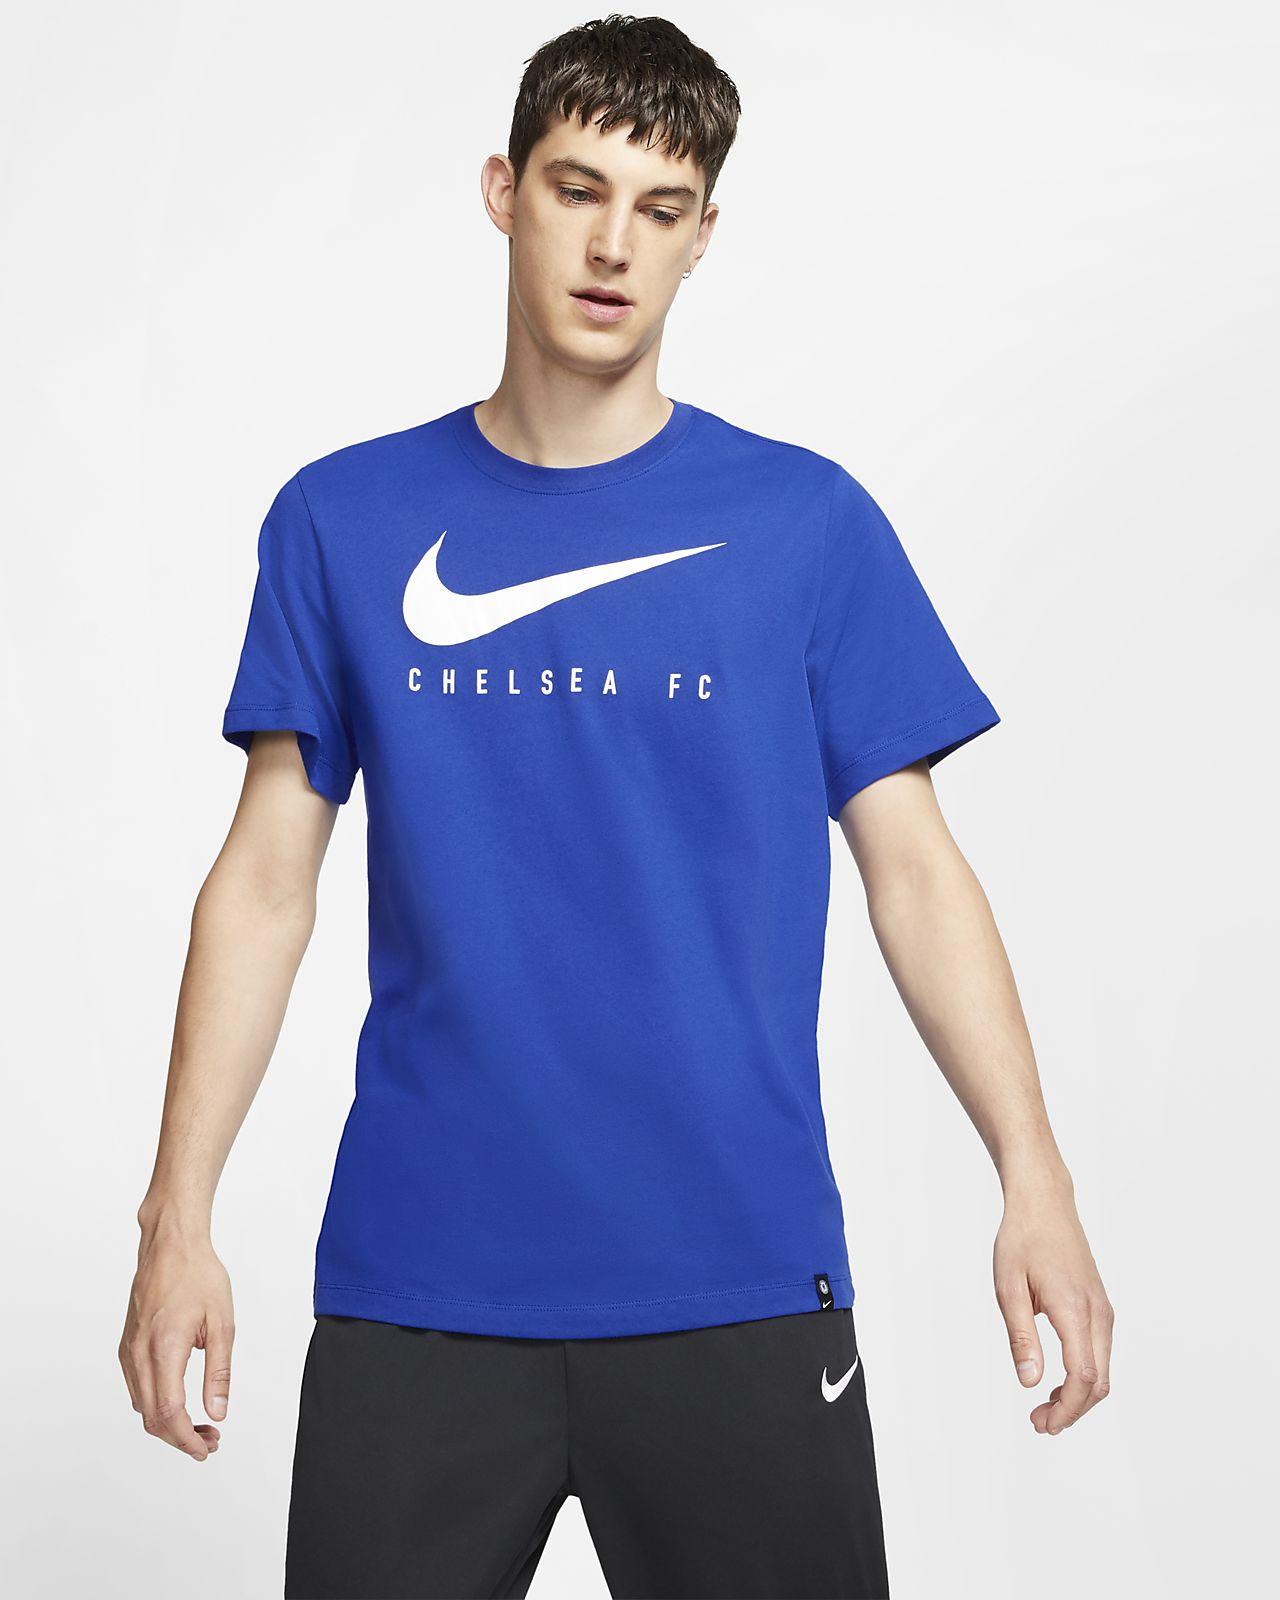 Playera de fútbol para hombre Chelsea FC Nike Dri-FIT